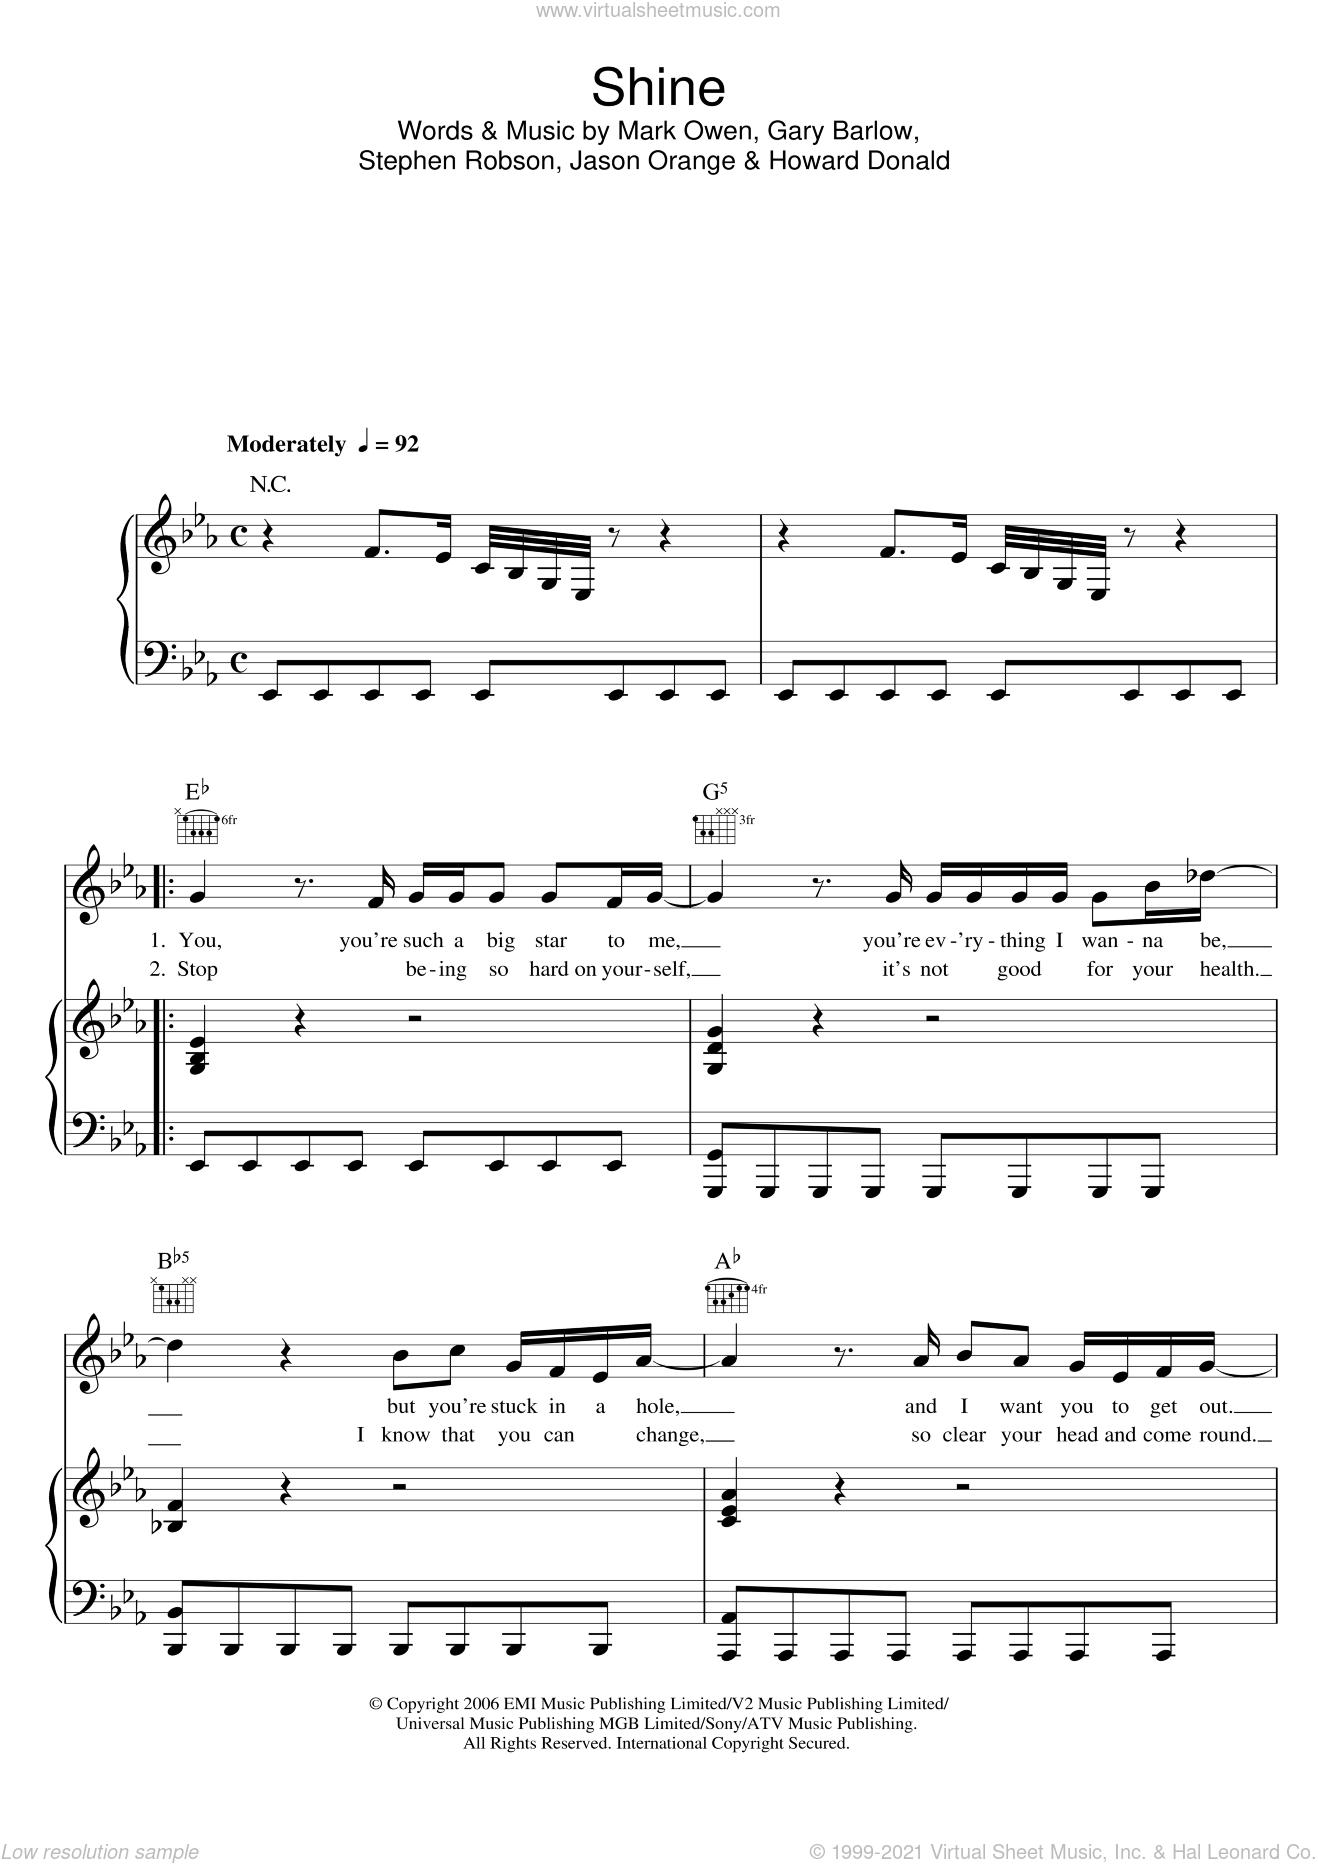 Shine sheet music for voice, piano or guitar by Take That, Gary Barlow, Howard Donald, Jason Orange, Mark Owen and Steve Robson, intermediate skill level